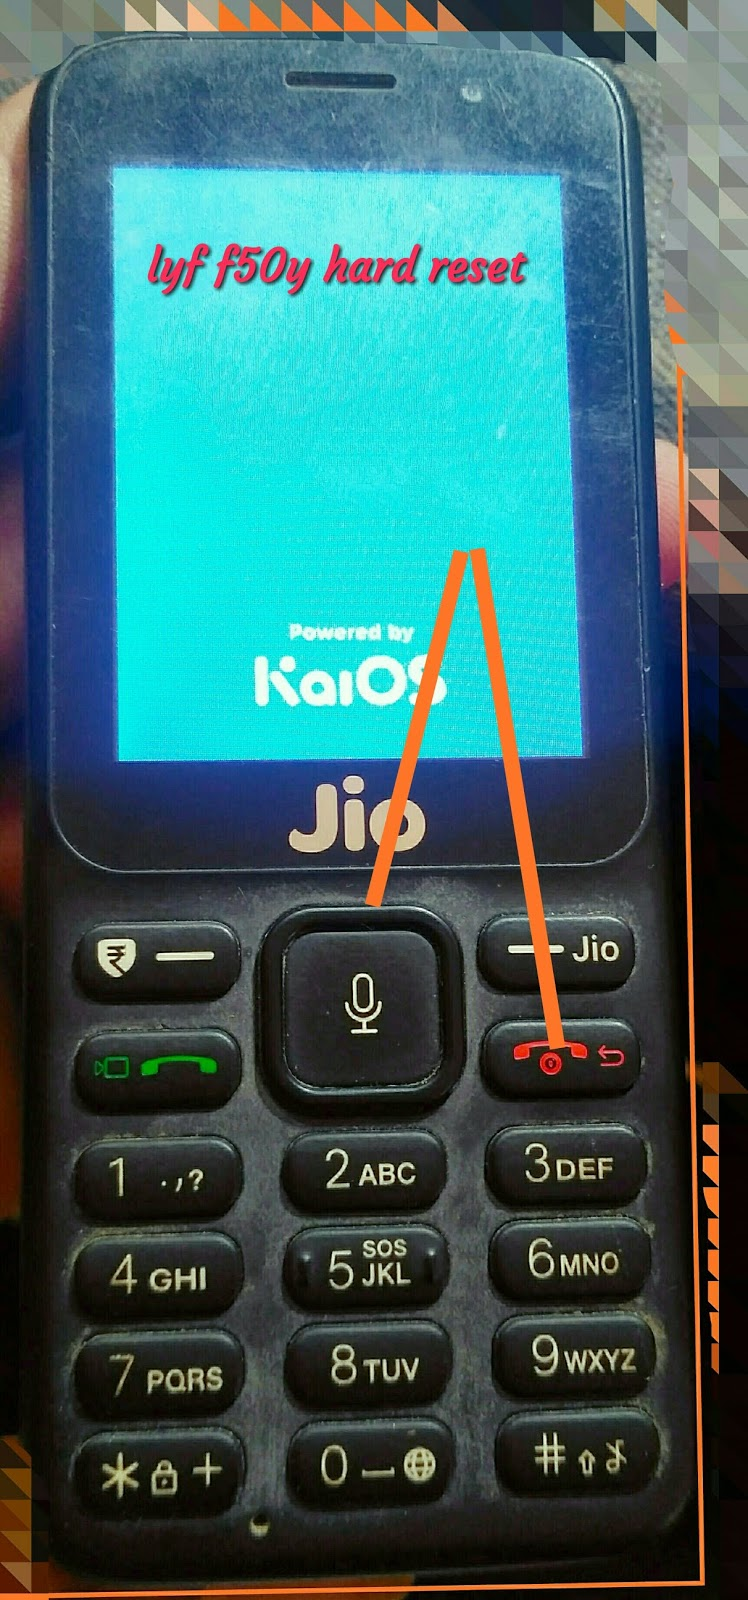 Lyf f50y hard reset key | Lavkush mobile com hargarh bajar mirzapur up